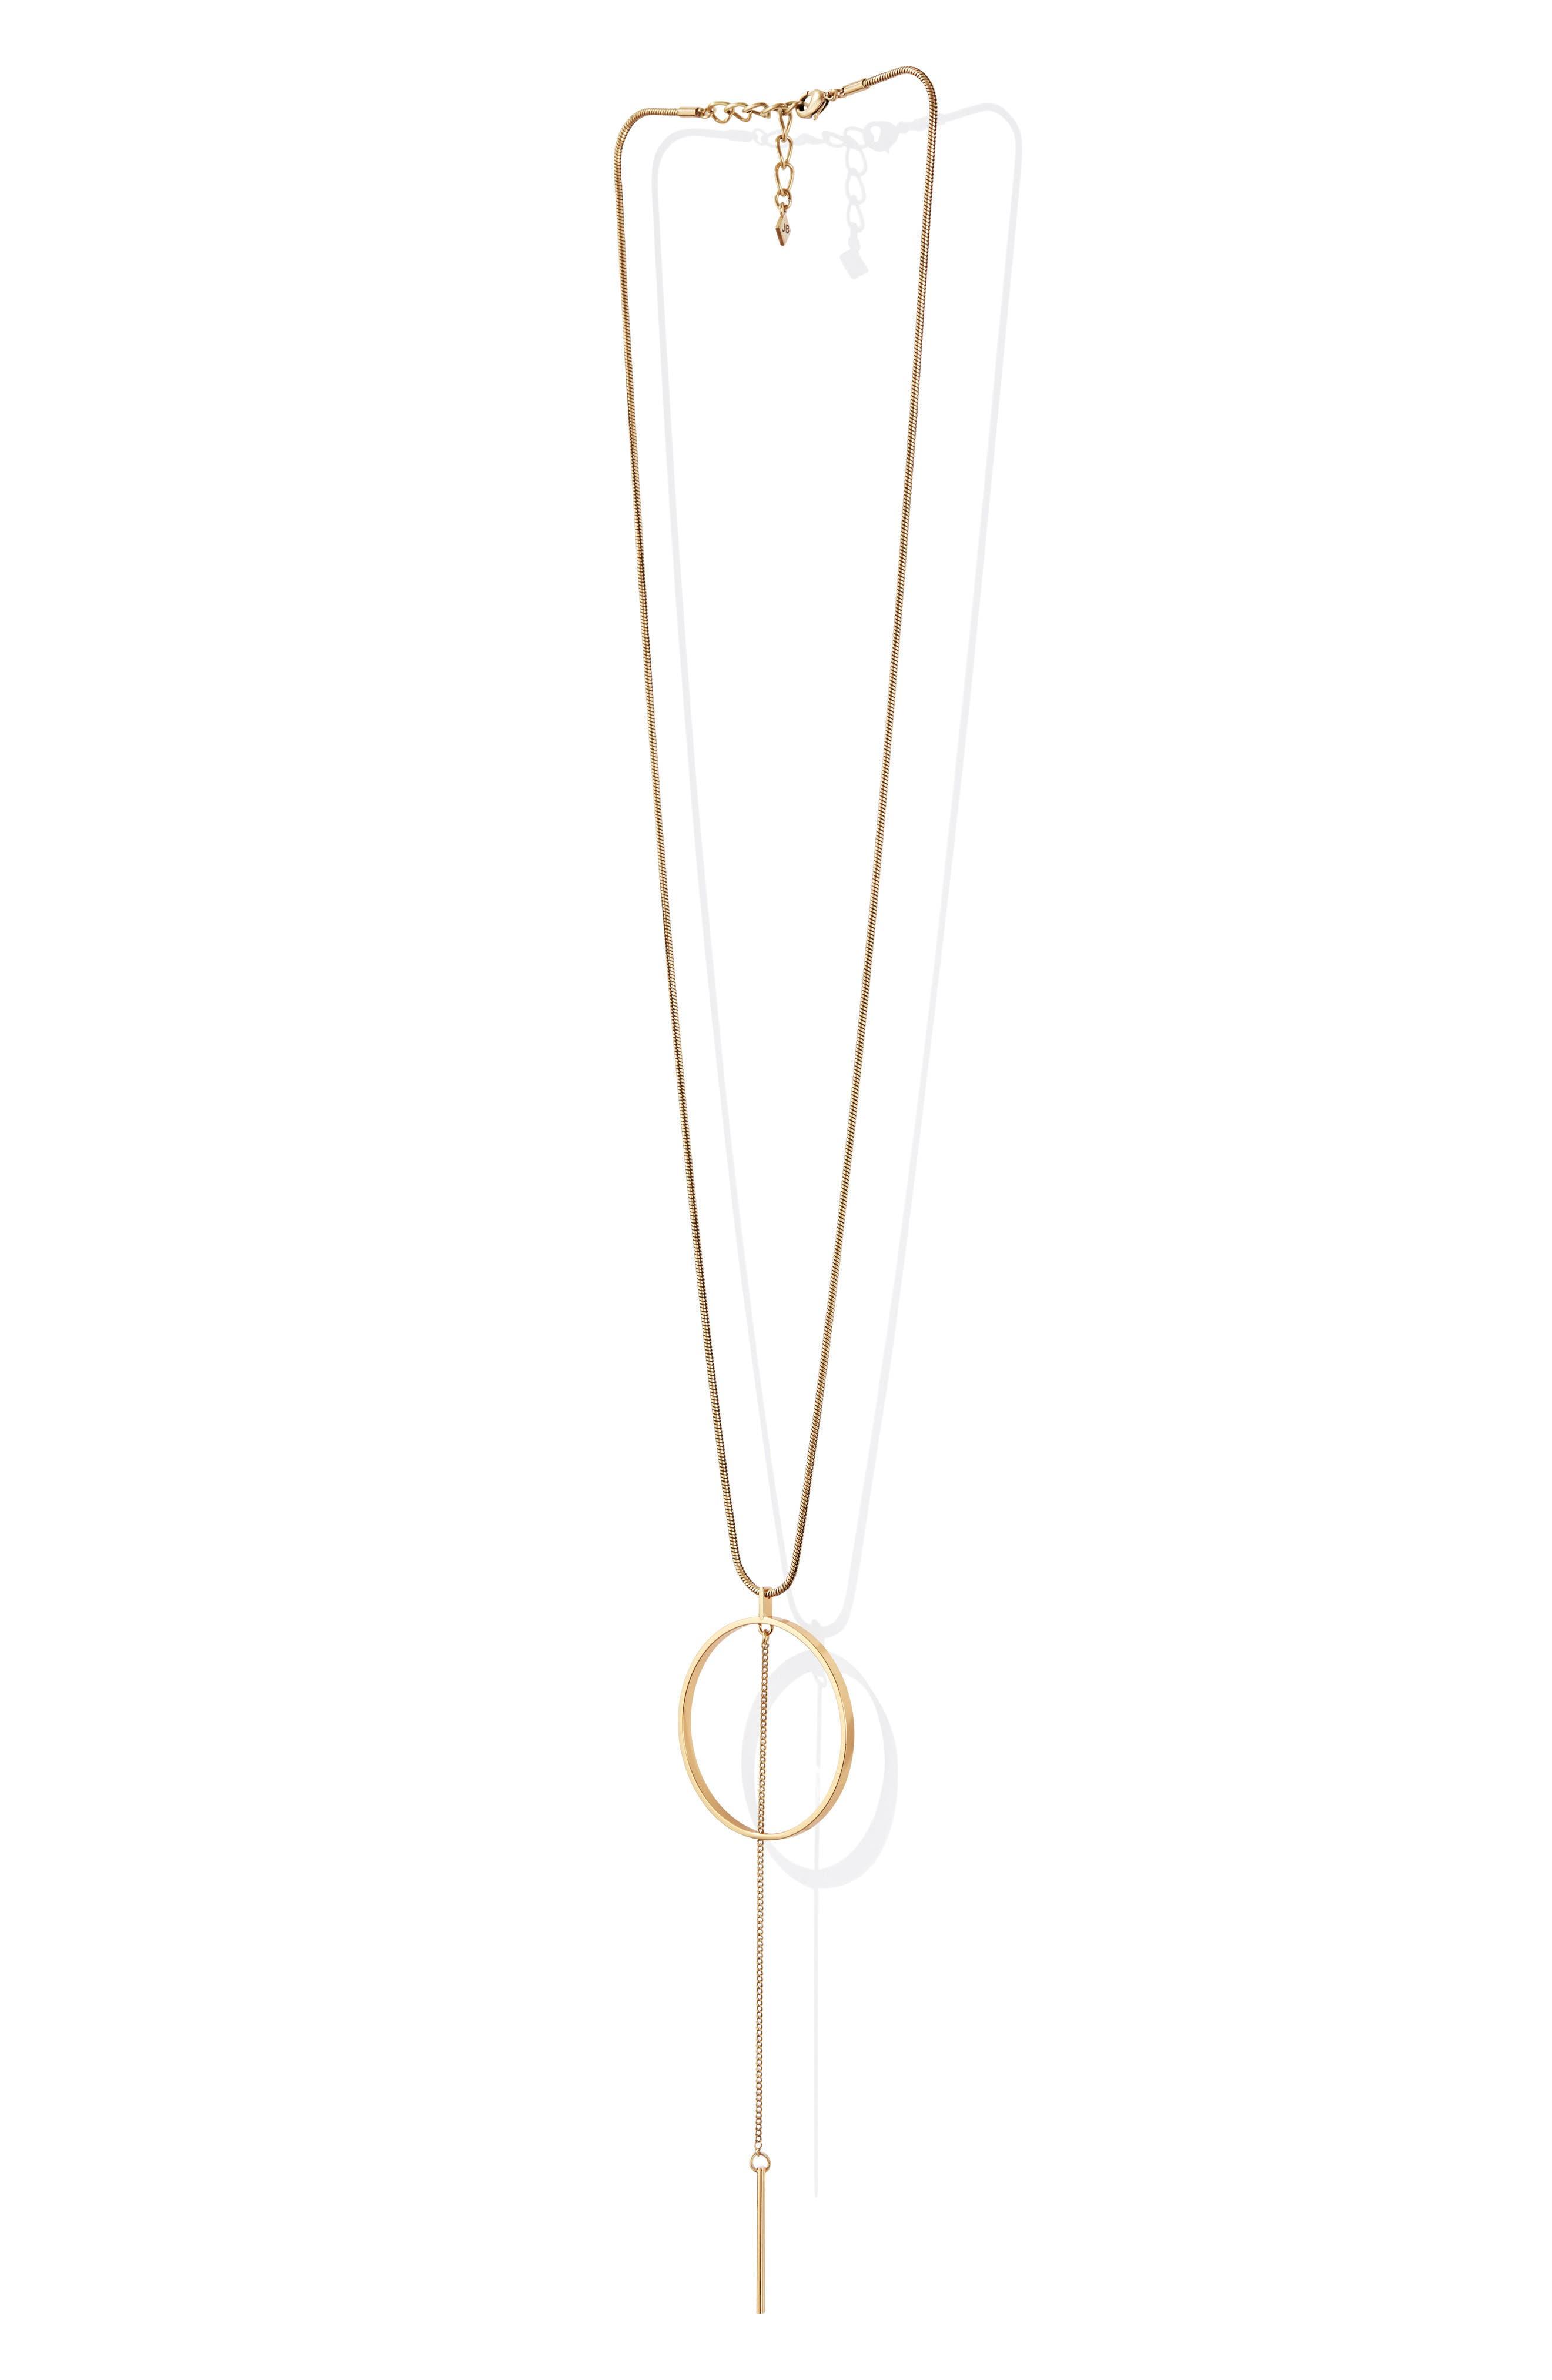 Rhine Pendant Necklace,                             Alternate thumbnail 4, color,                             GOLD